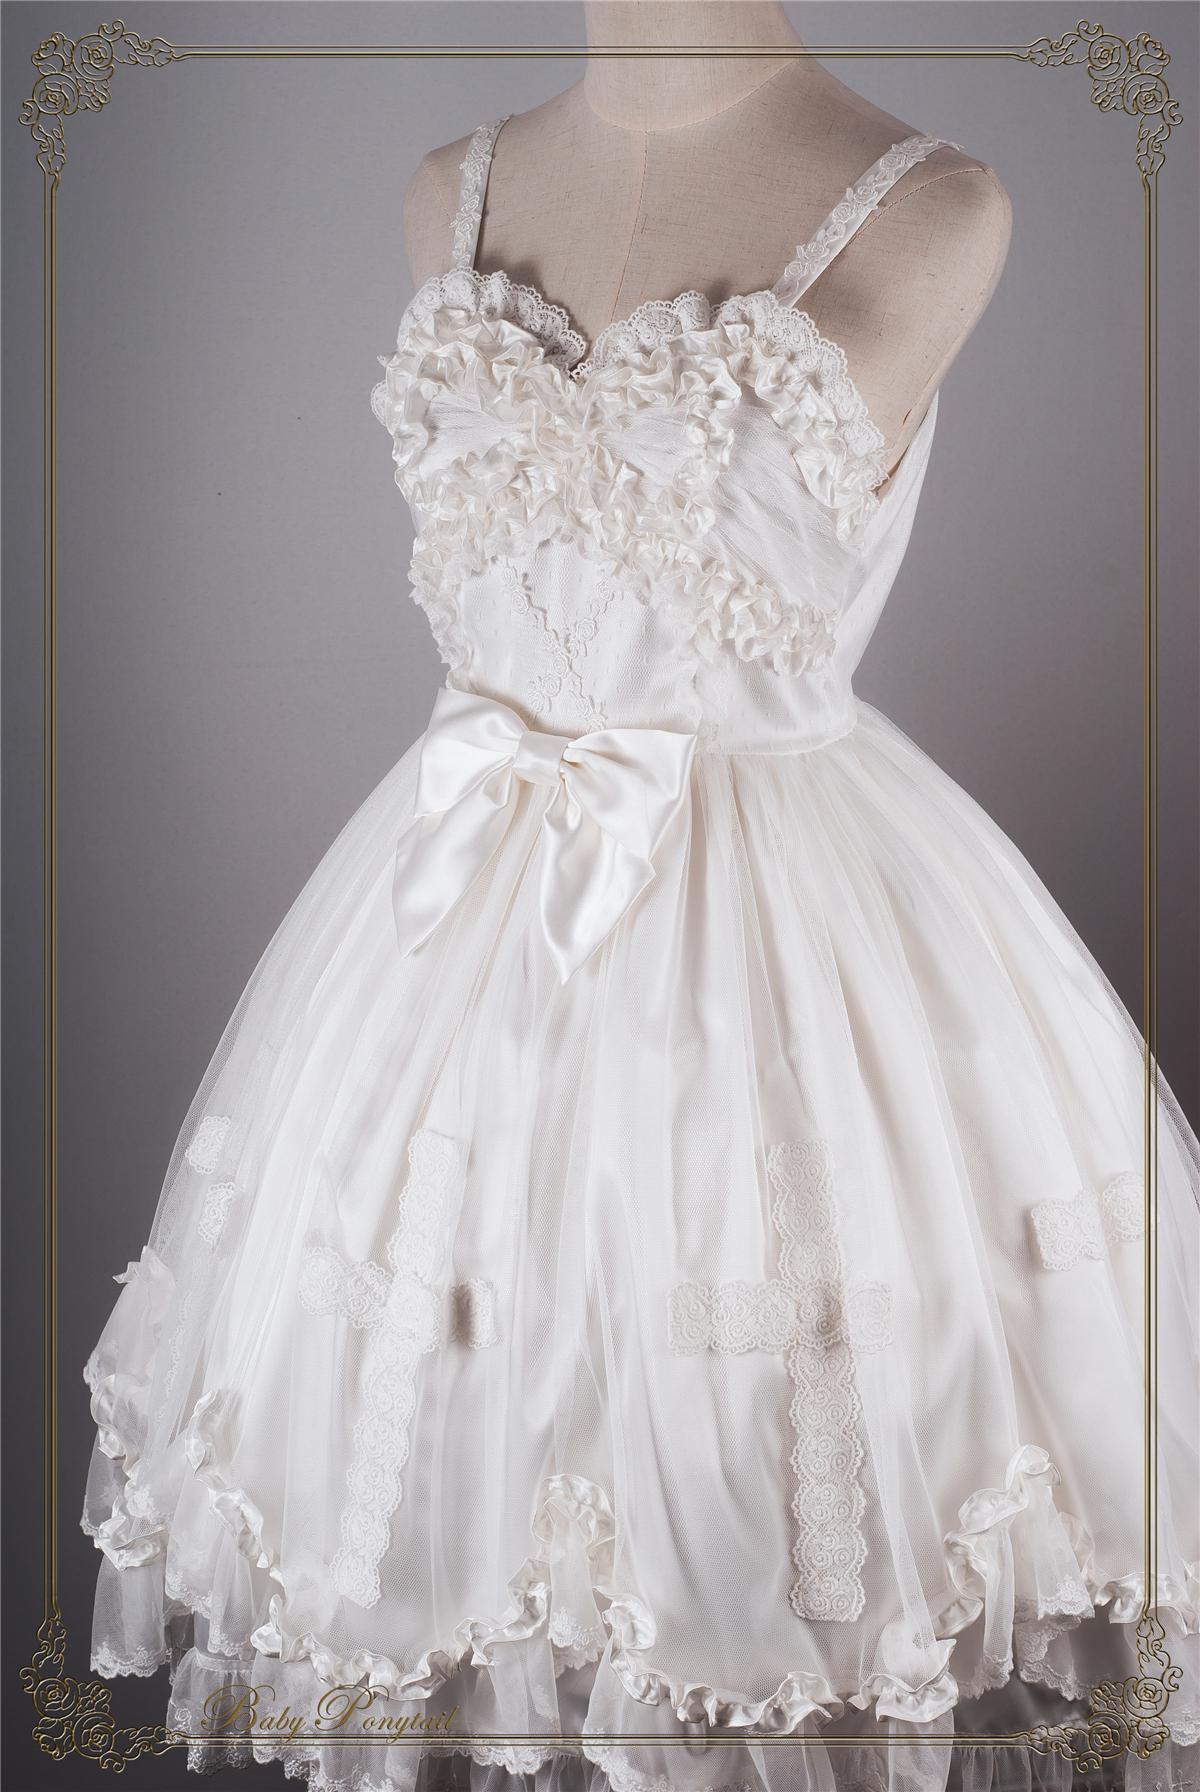 Babyponytail_Heavenly Teardrops_JSK White Stock Photo_02.jpg